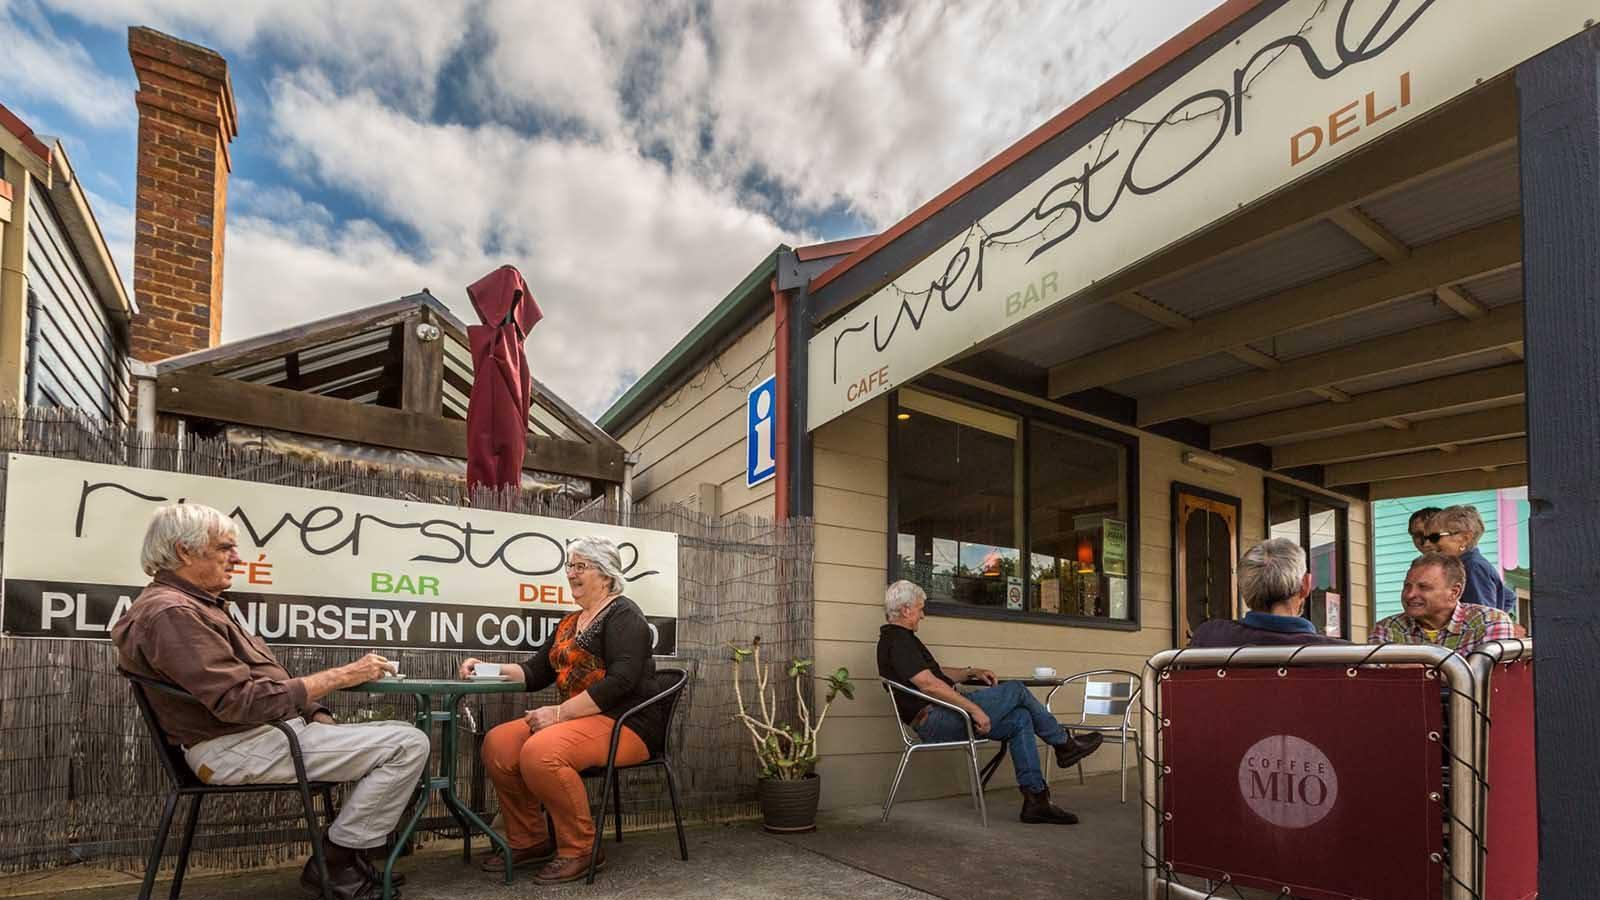 Riverstone Cafe, Briagolong, Gippsland, Victoria, Australia